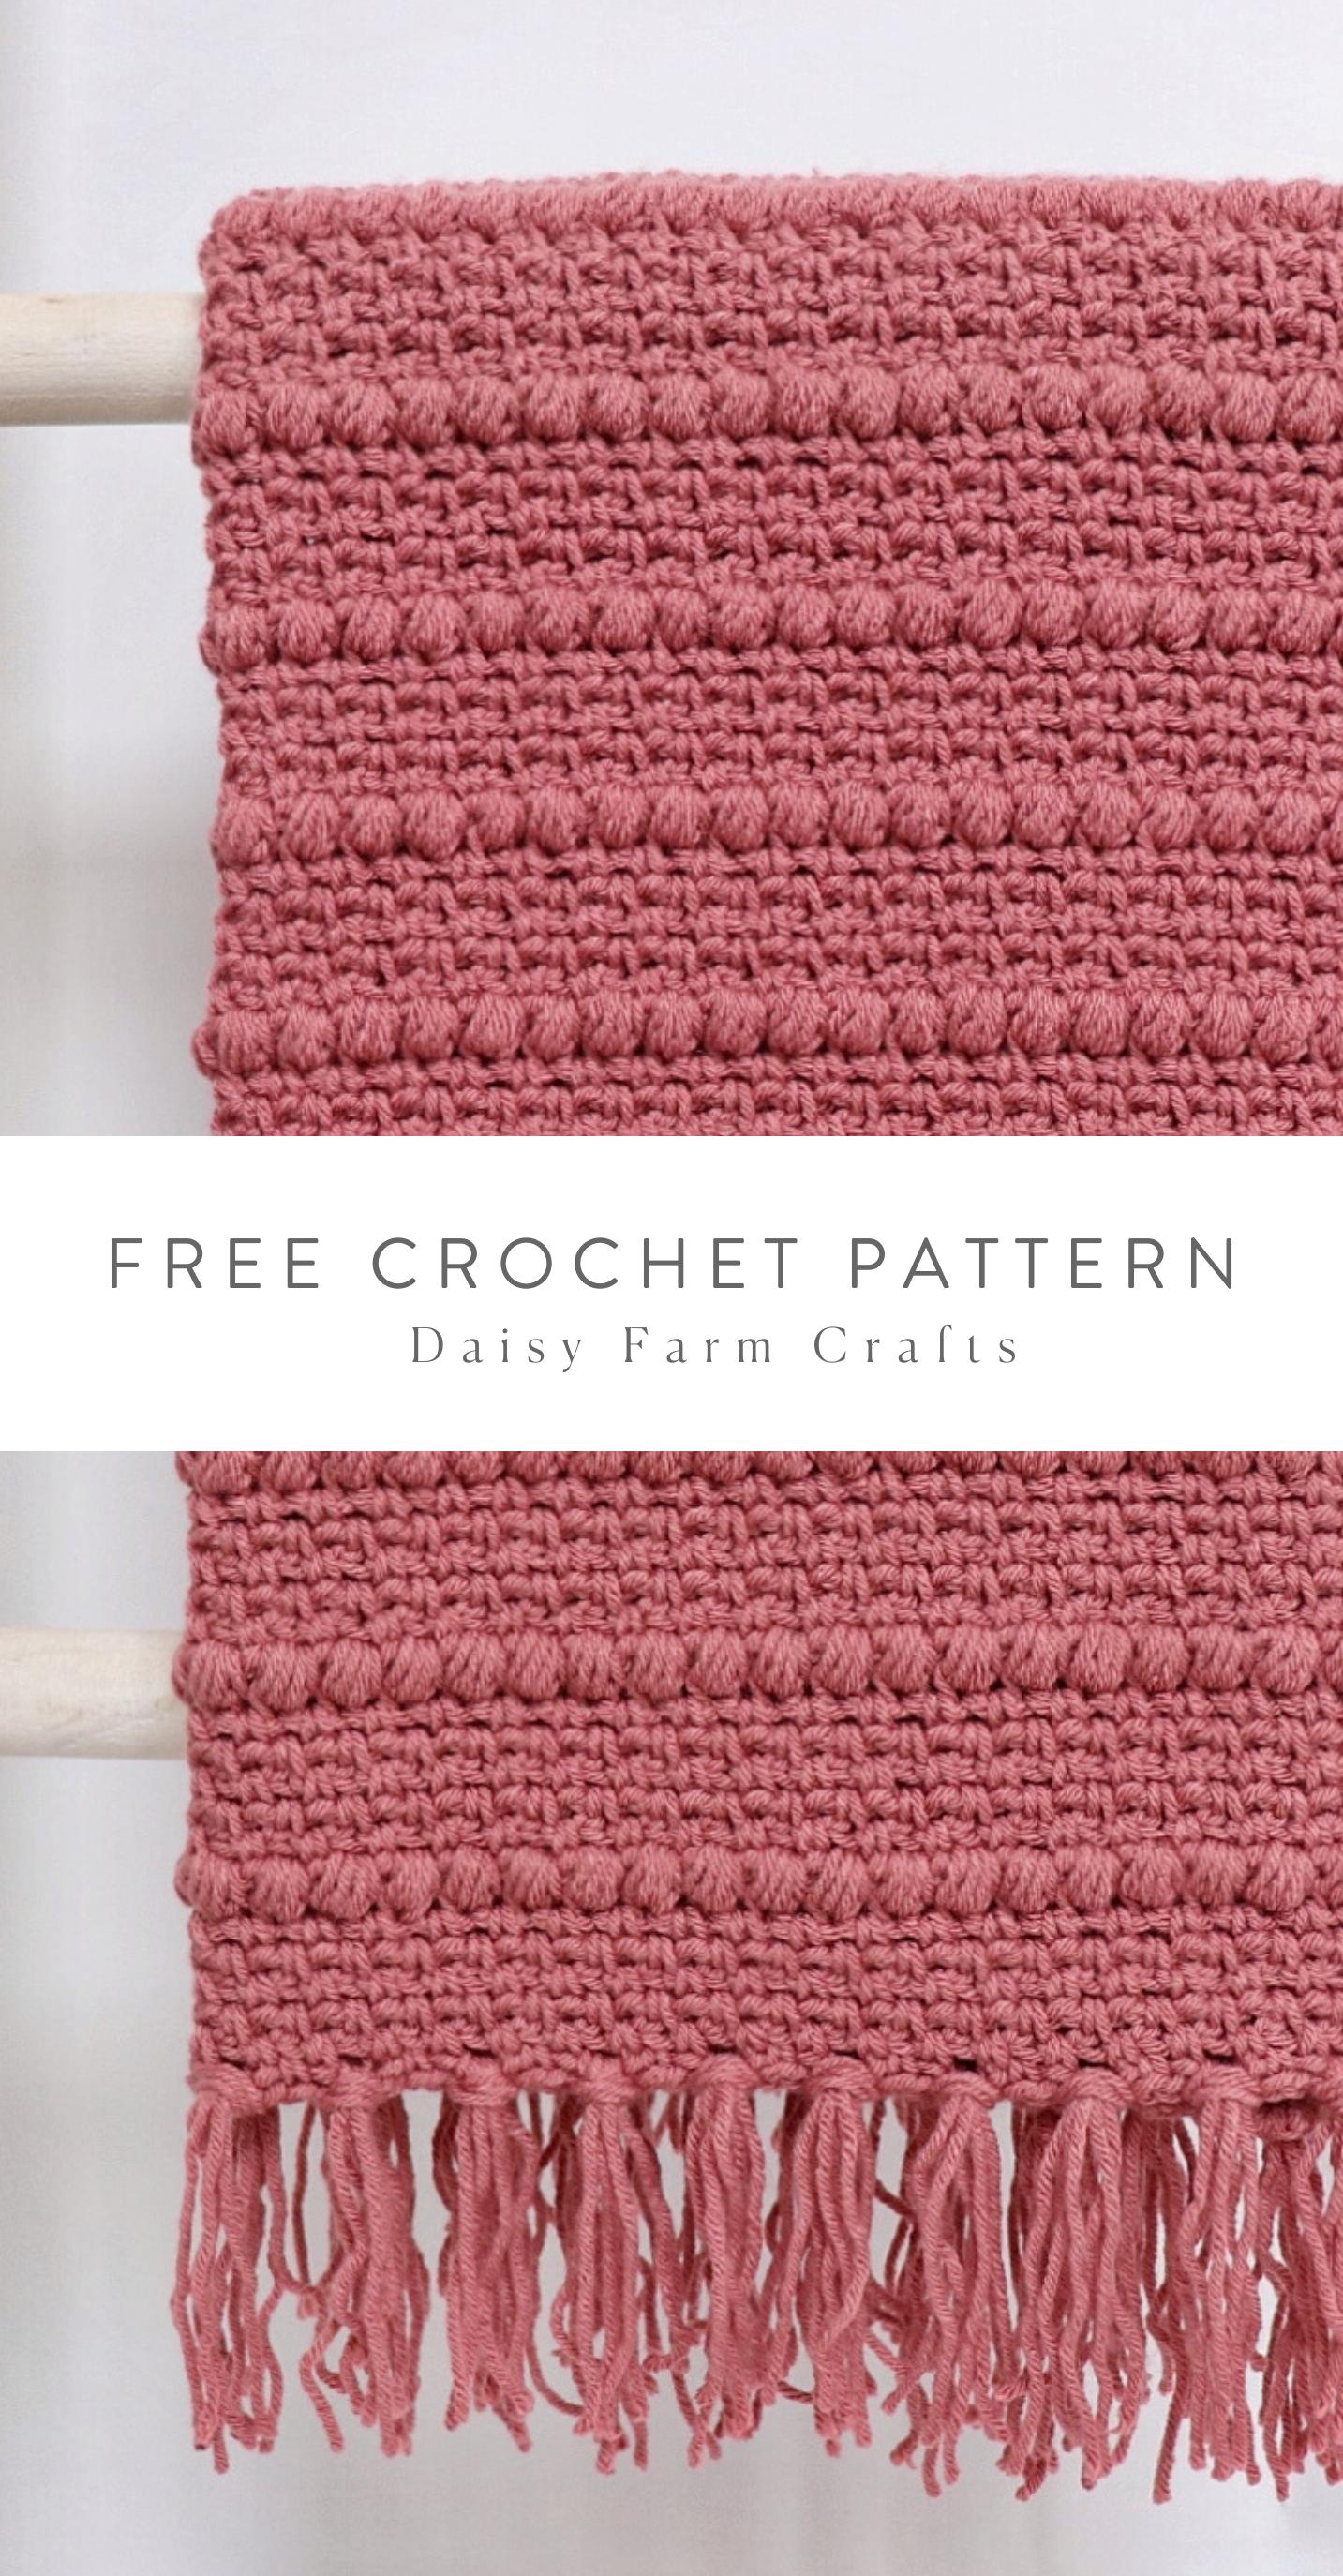 Free Crochet Pattern - Boho Puff Stripes Blanket